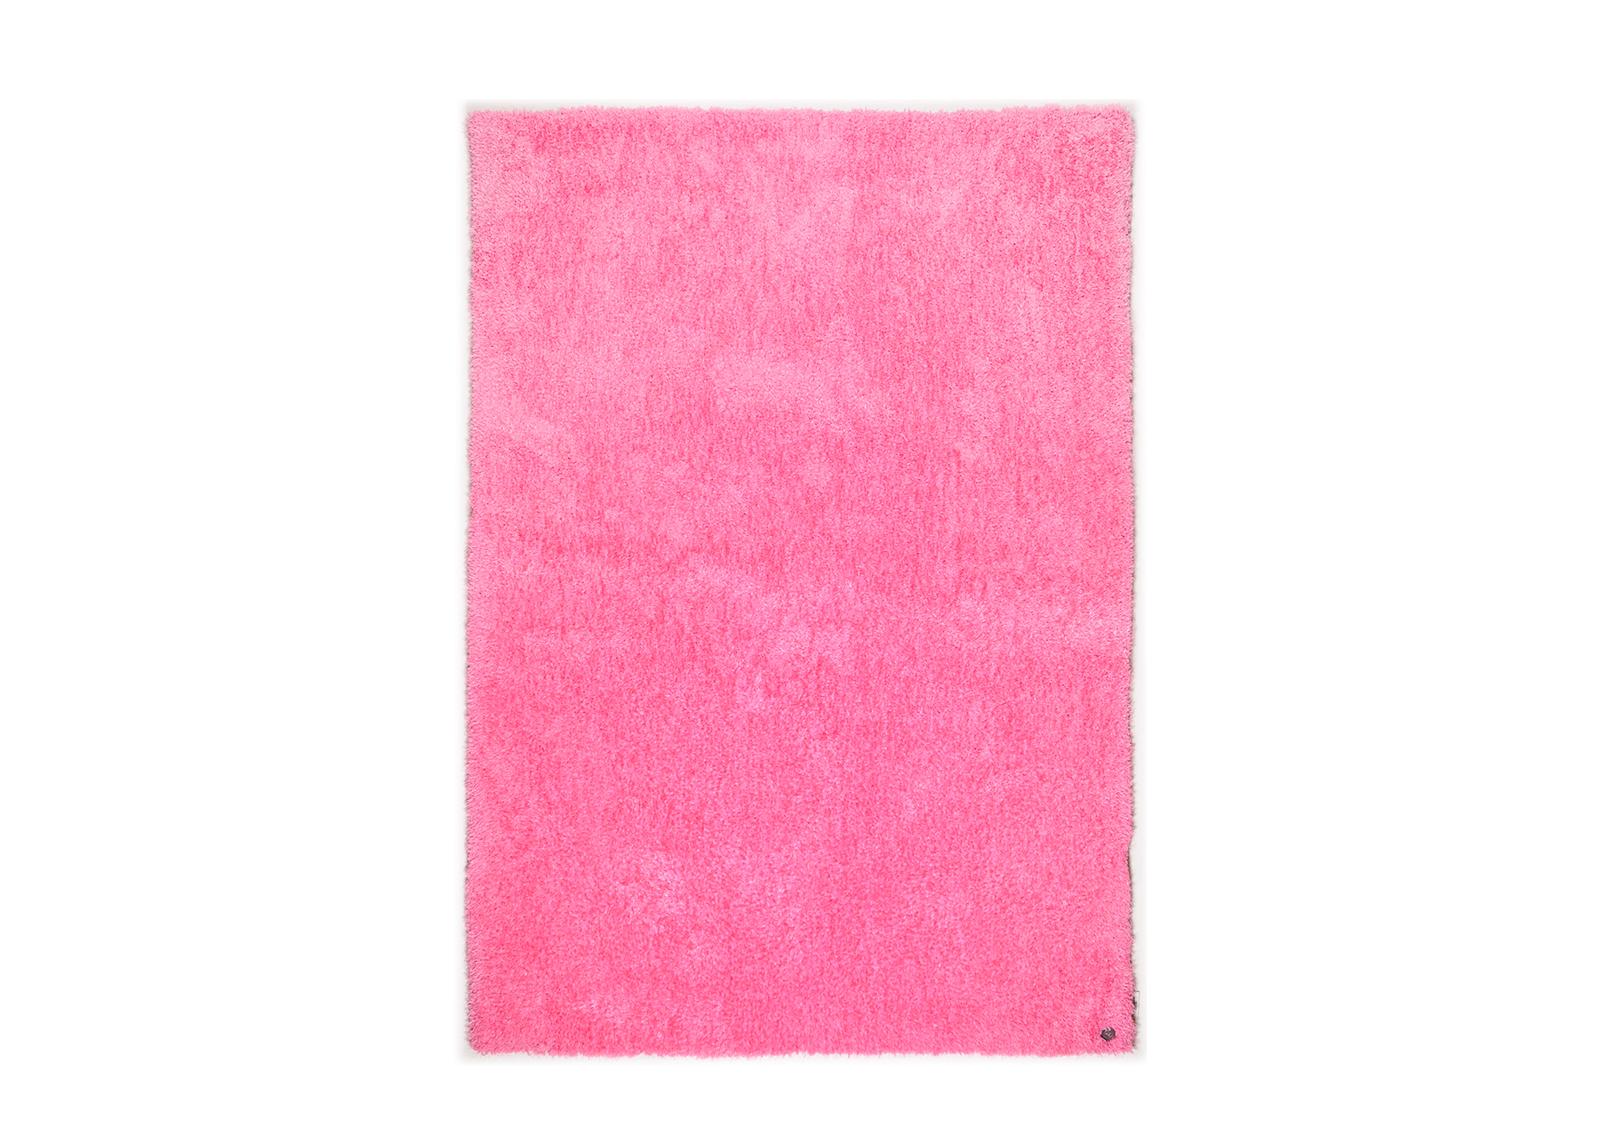 Tom Tailor matto Soft Uni 65x135 cm, vaaleanpunainen